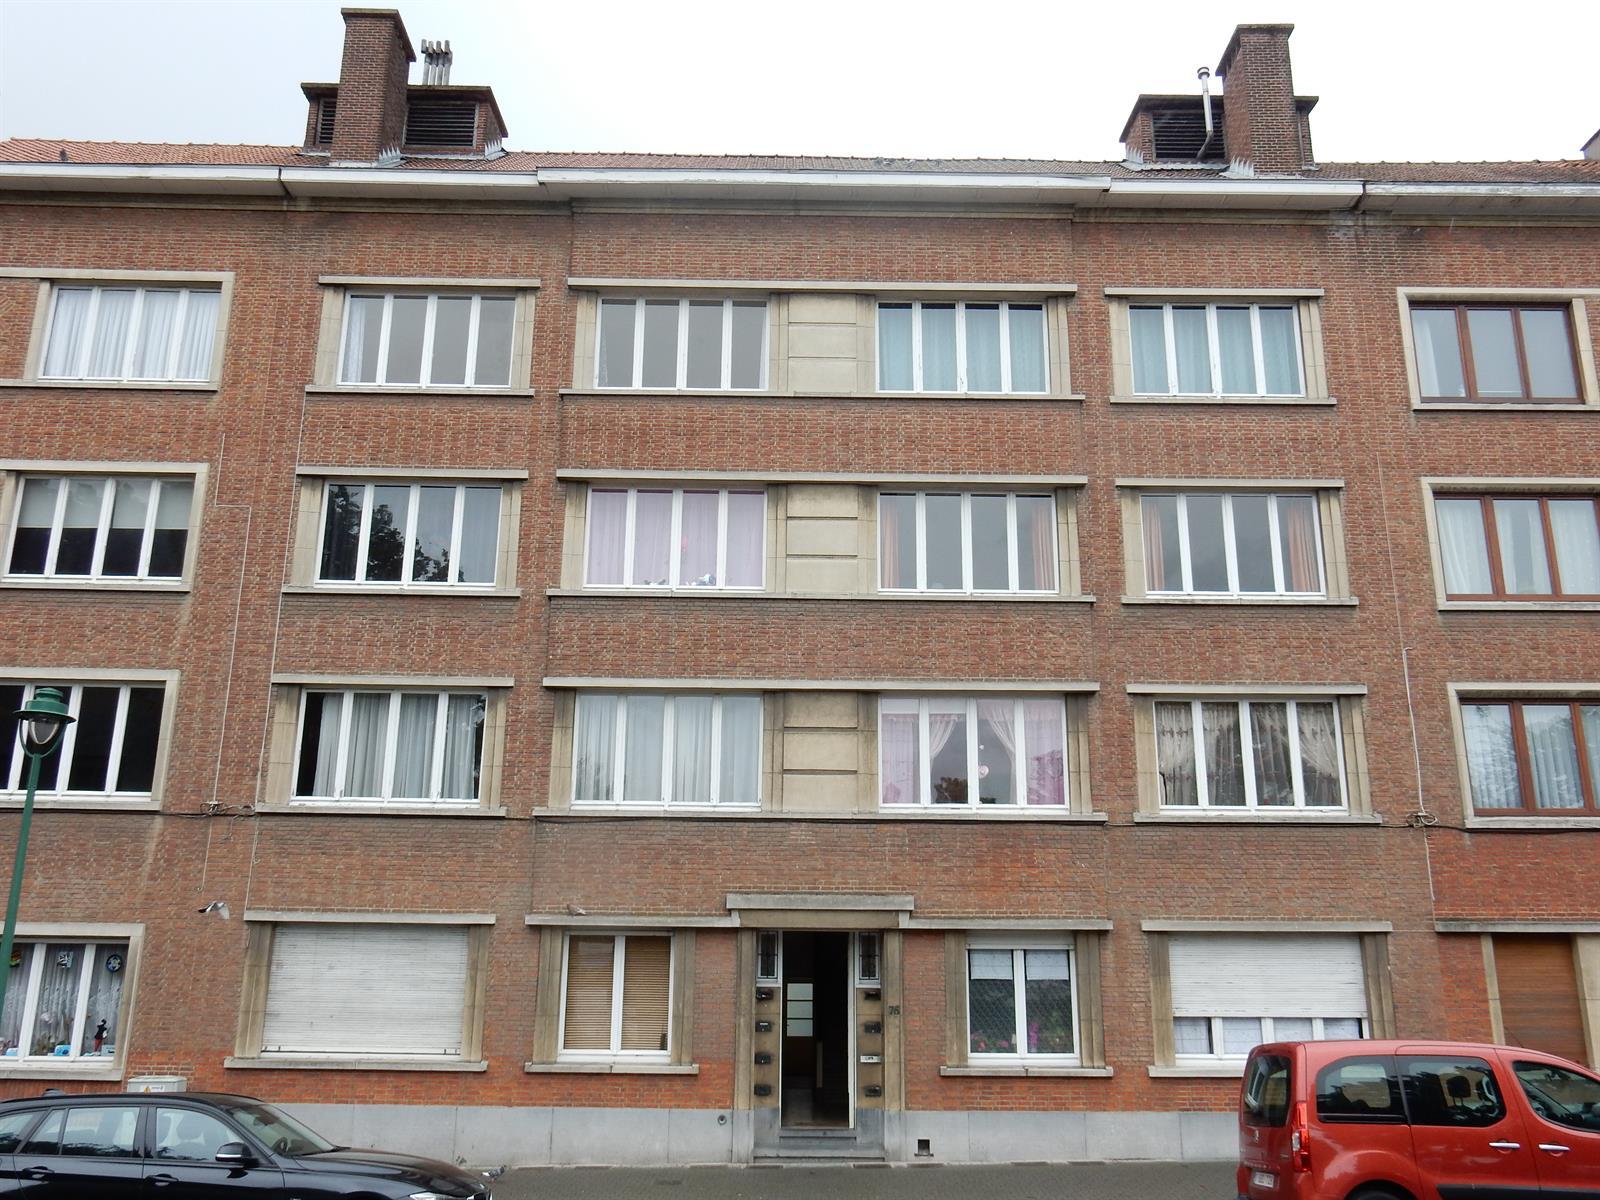 Flat - Molenbeek-Saint-Jean - #3956375-23